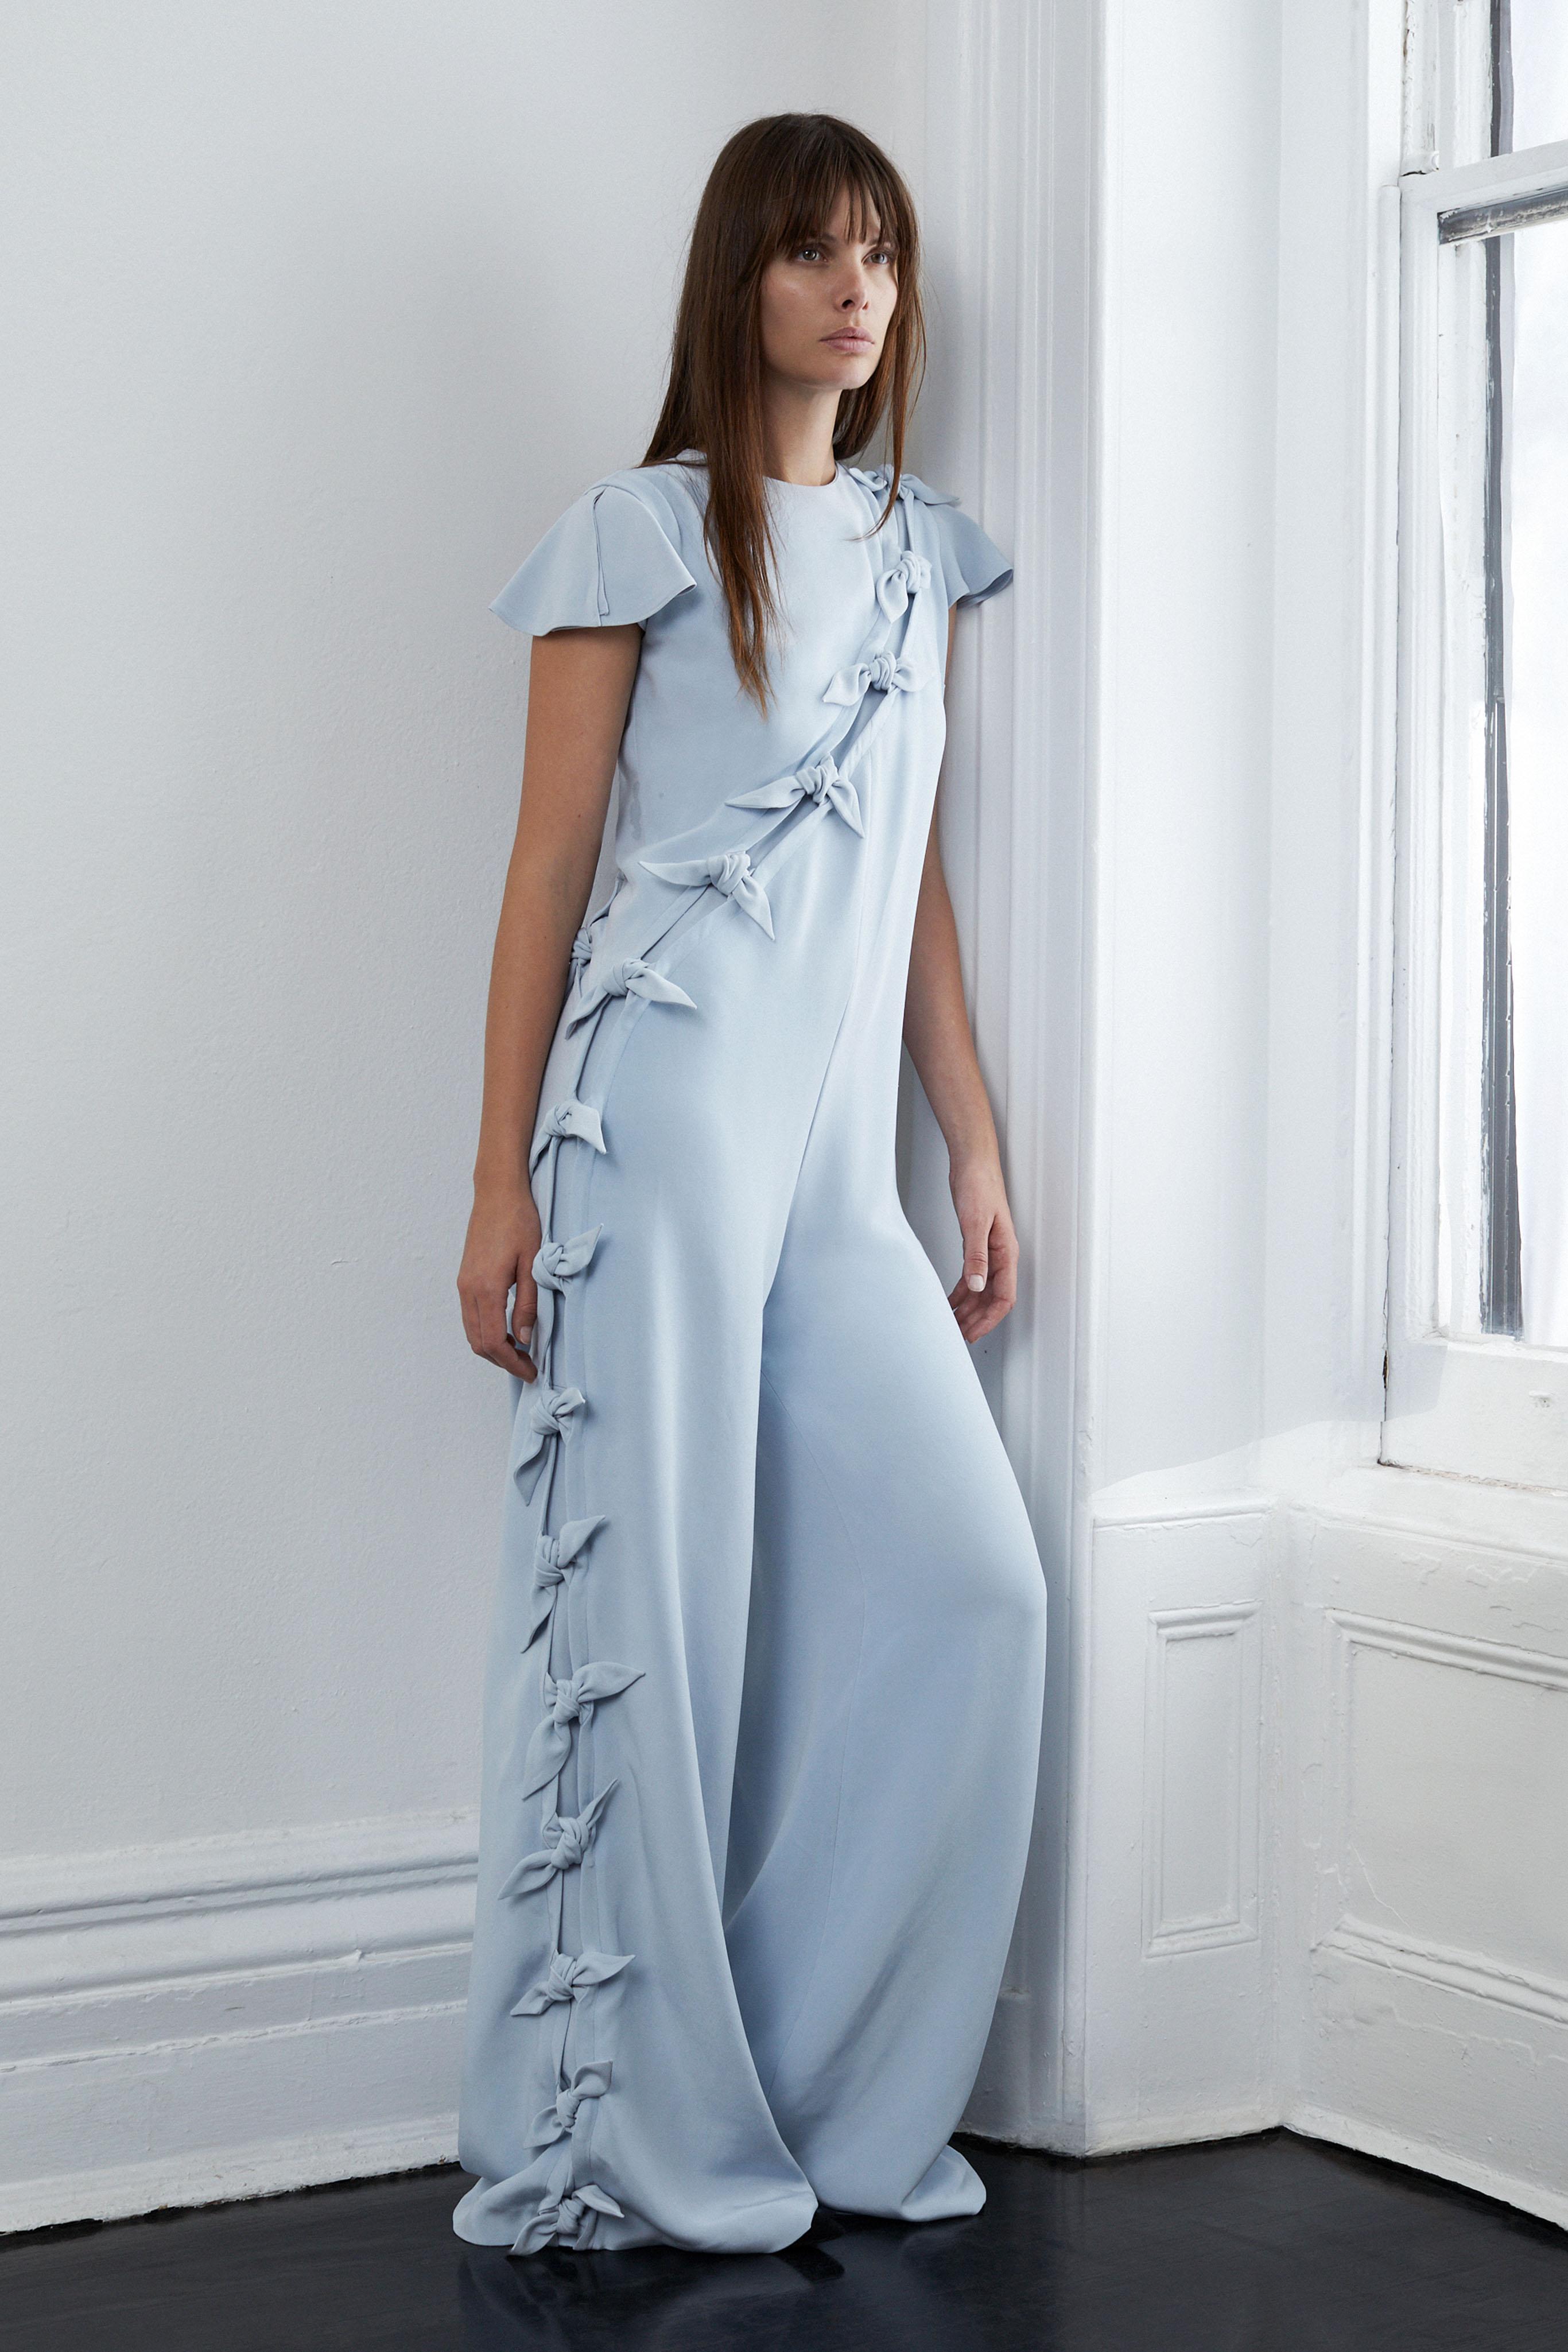 lein fall 2018 wedding dress blue jumpsuit short sleeves ties